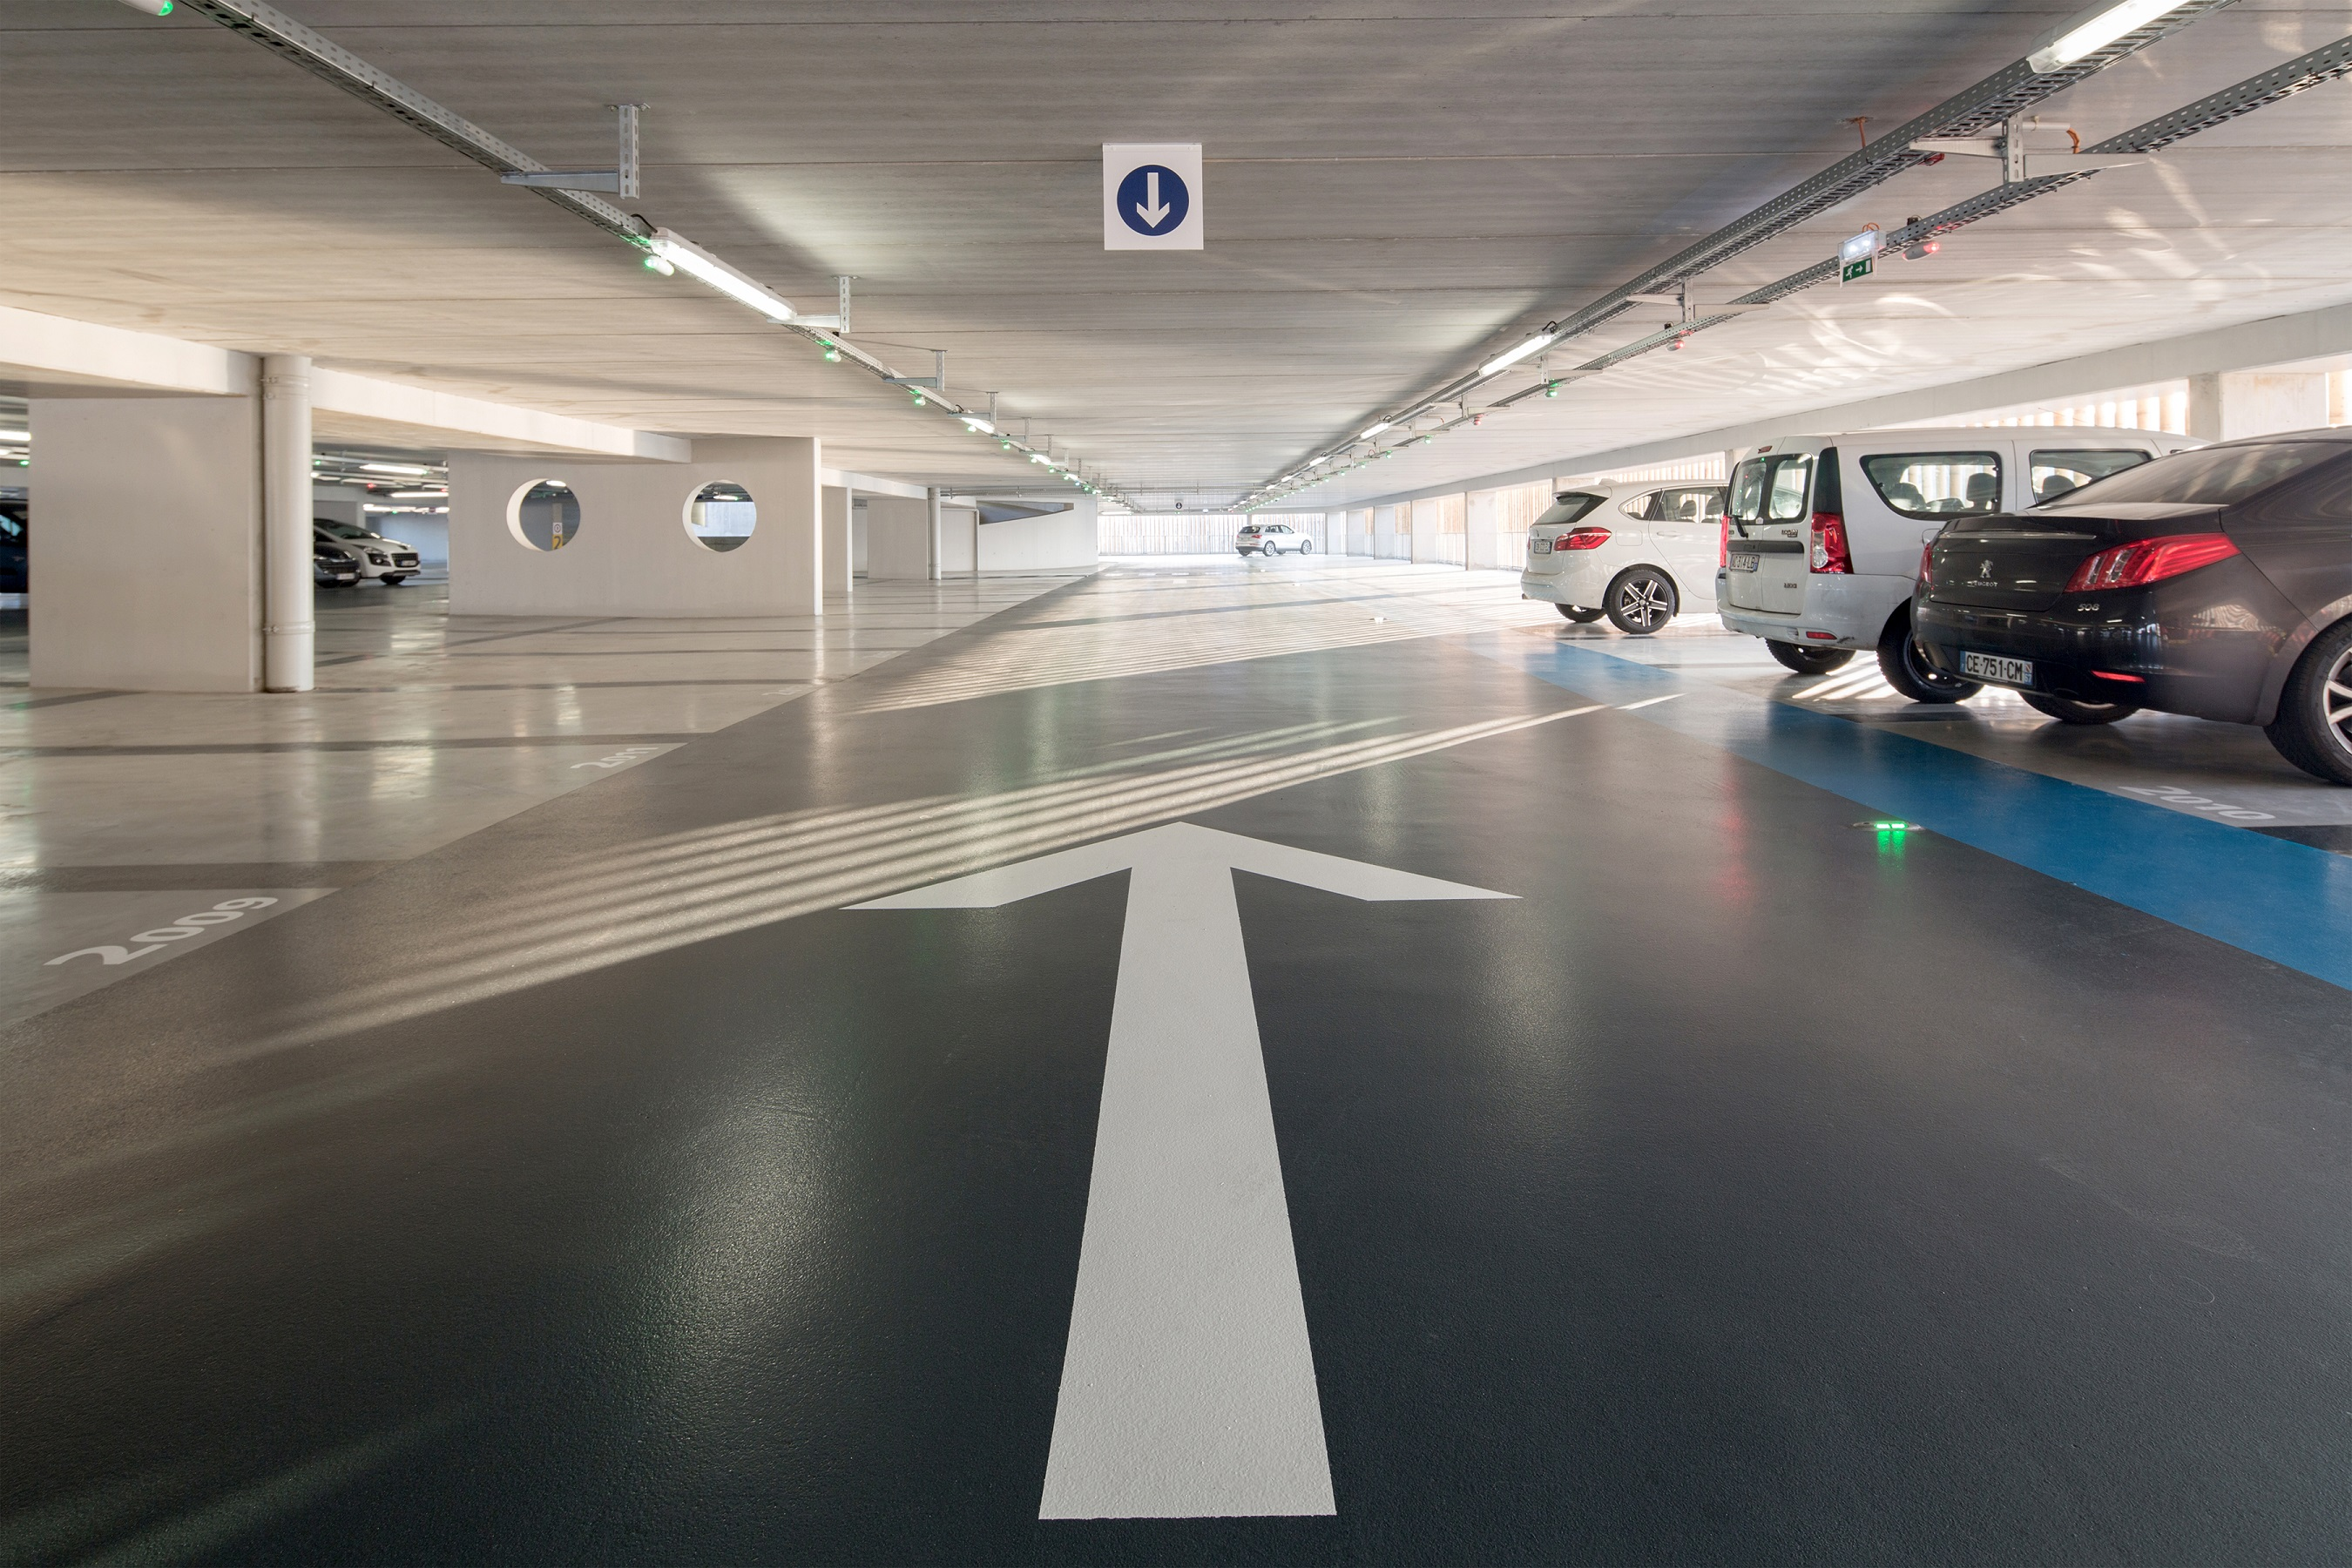 Parking Indigo Saint-Germain-En-Laye Centre Hospitalier